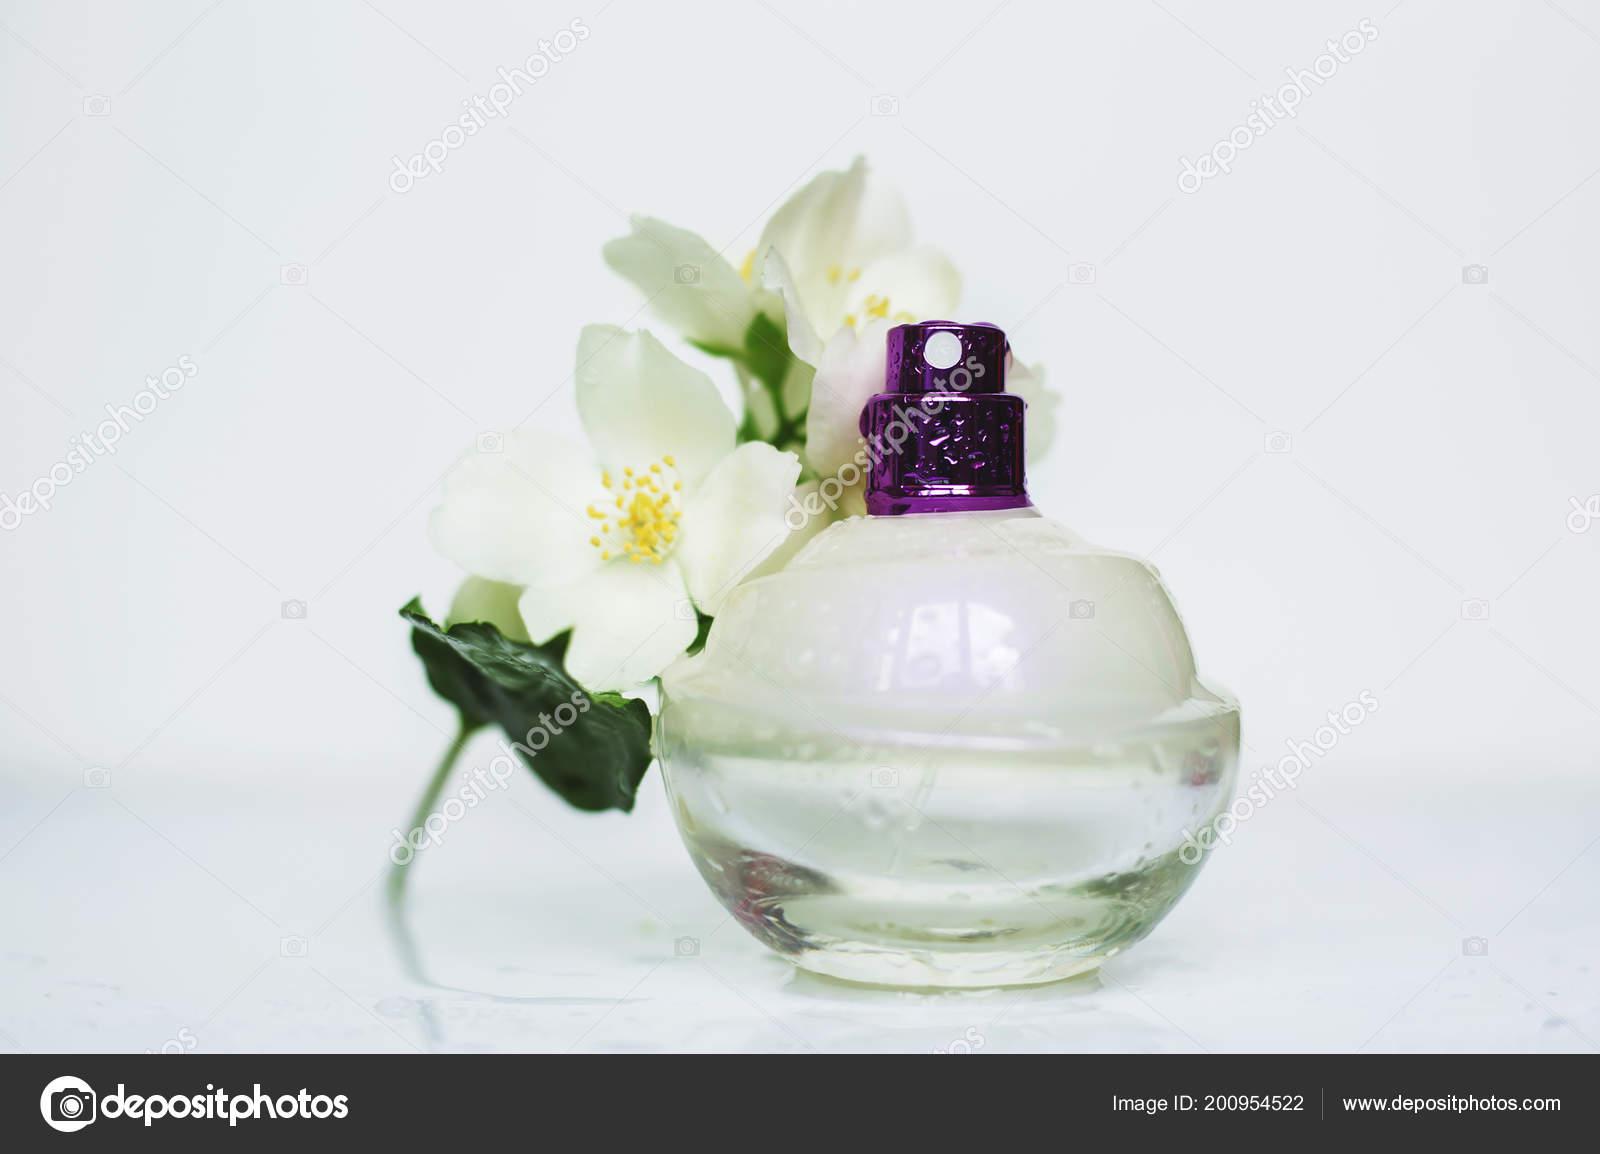 Perfume bottle white flowers stock photo martyna1802 200954522 perfume bottle white flowers stock photo mightylinksfo